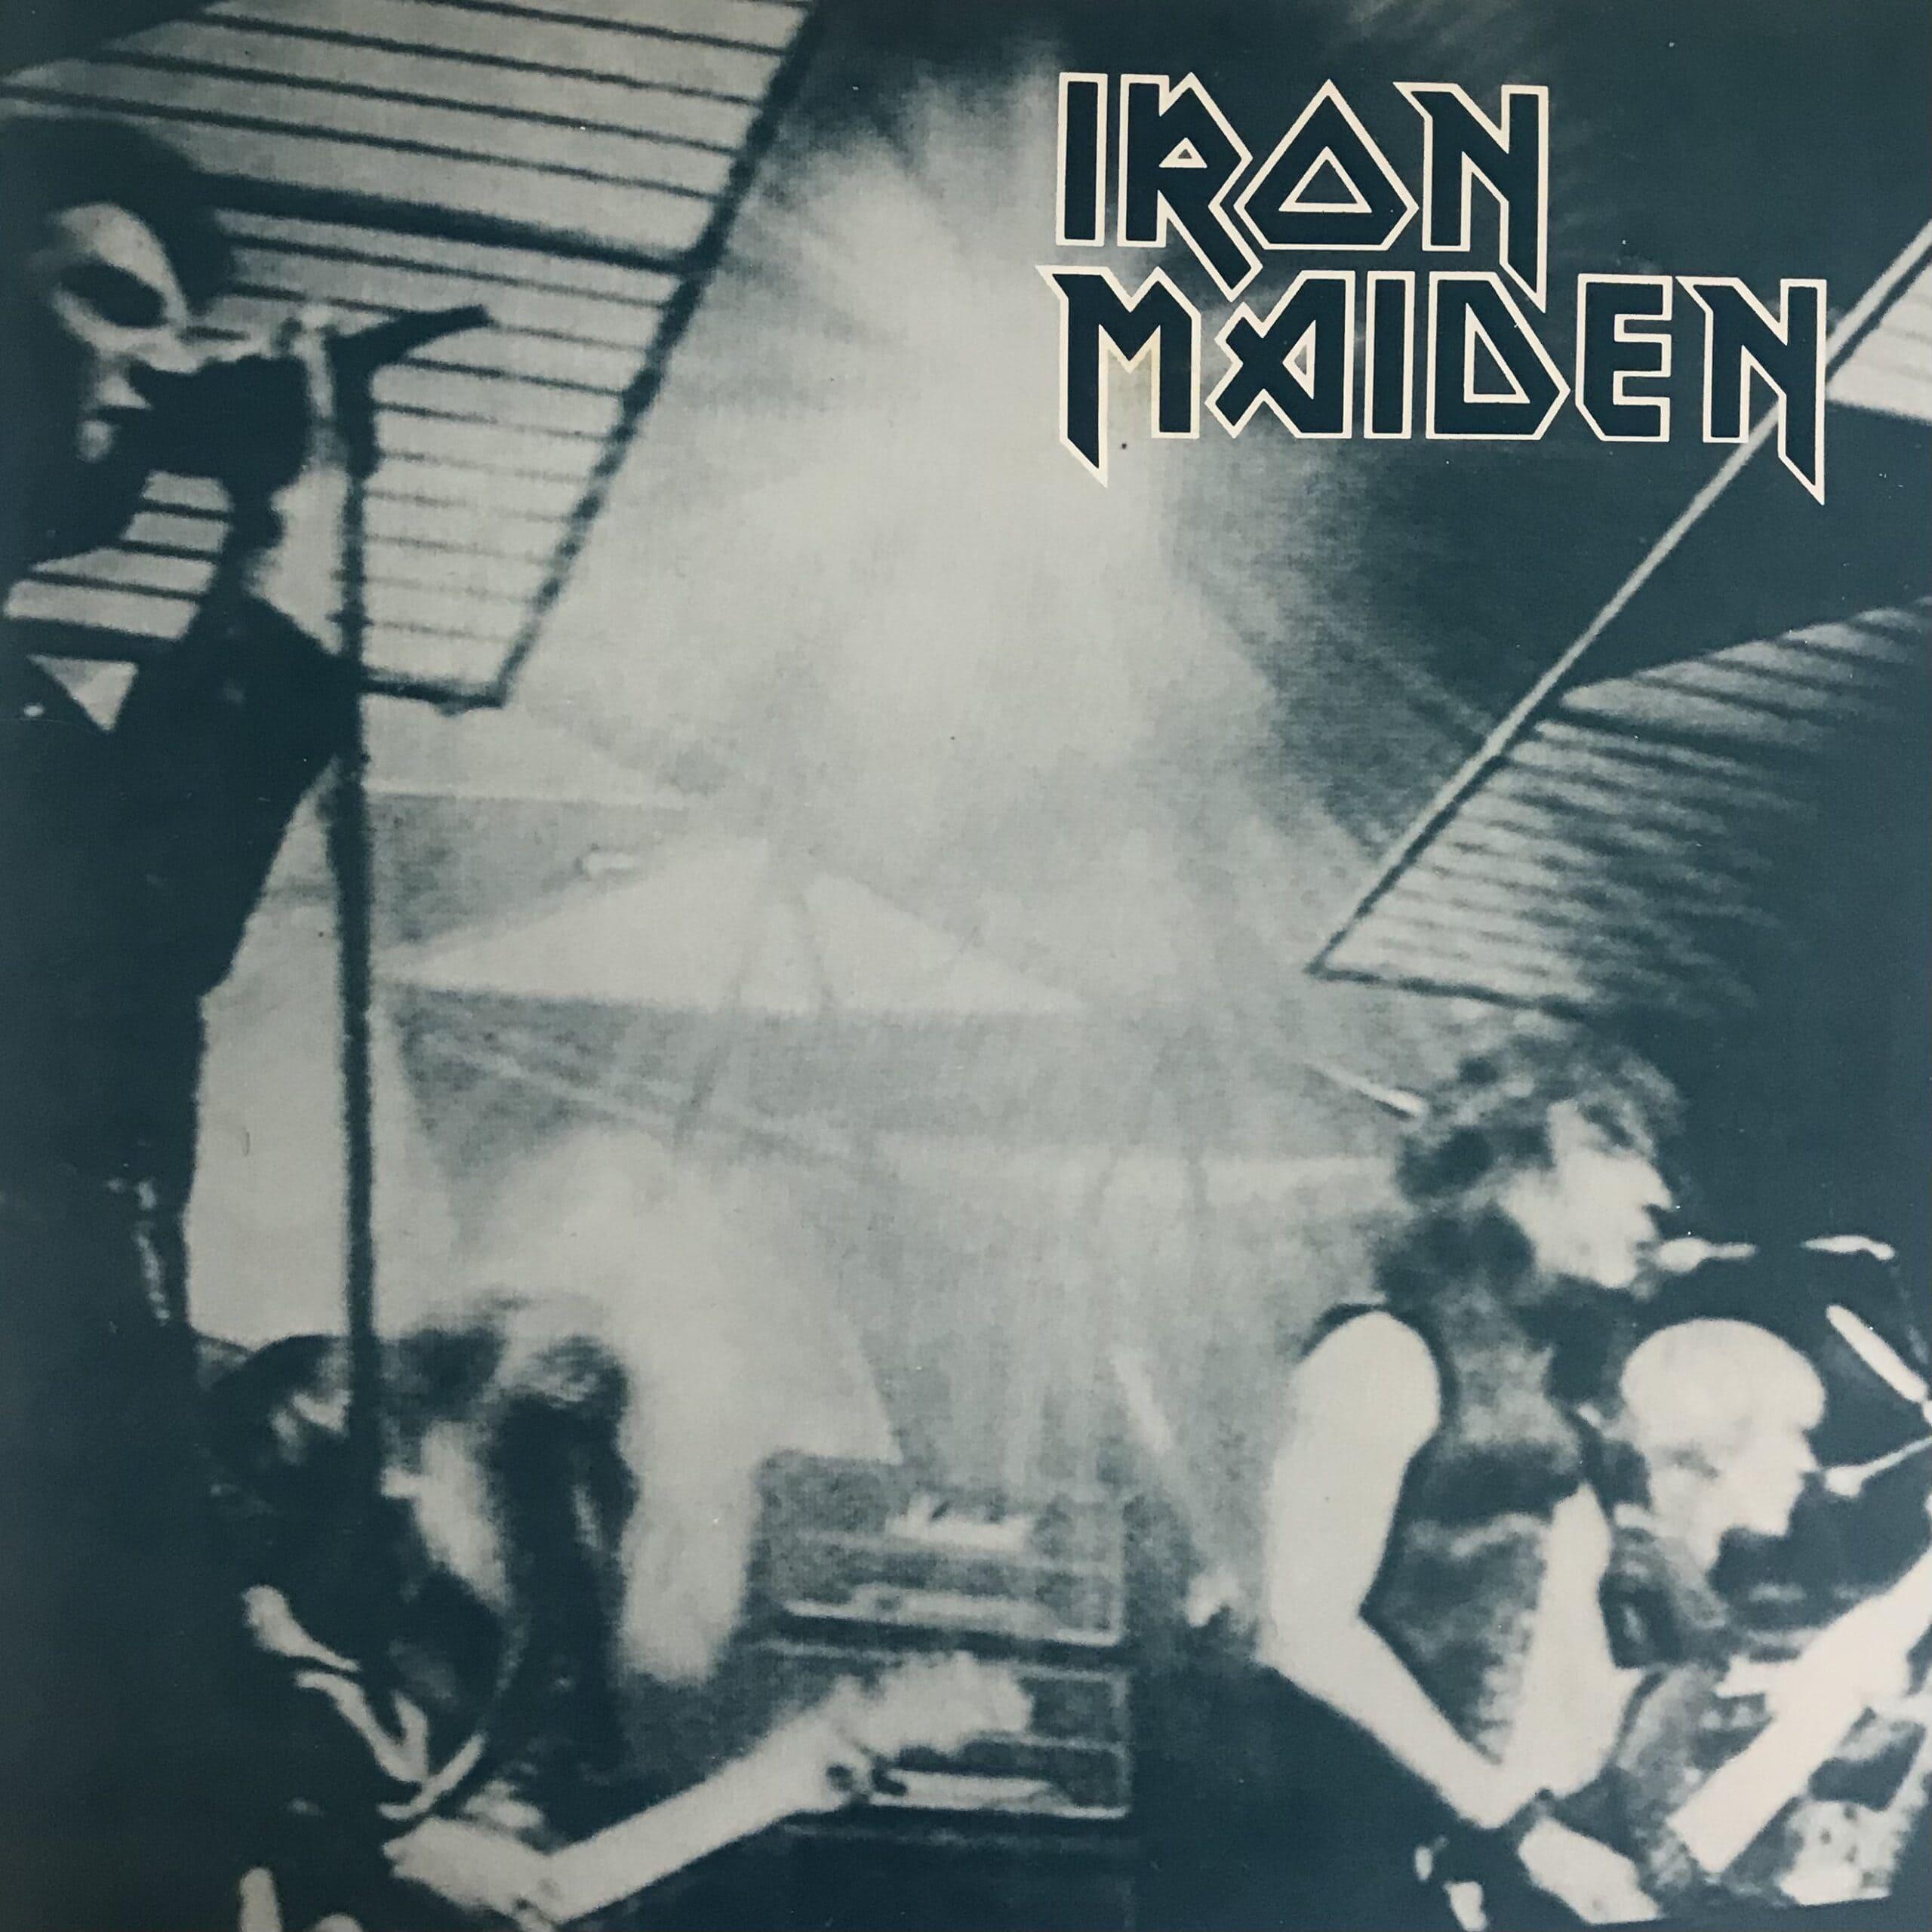 Iron Maiden / Killers '81 / UD-6539 / ブート盤